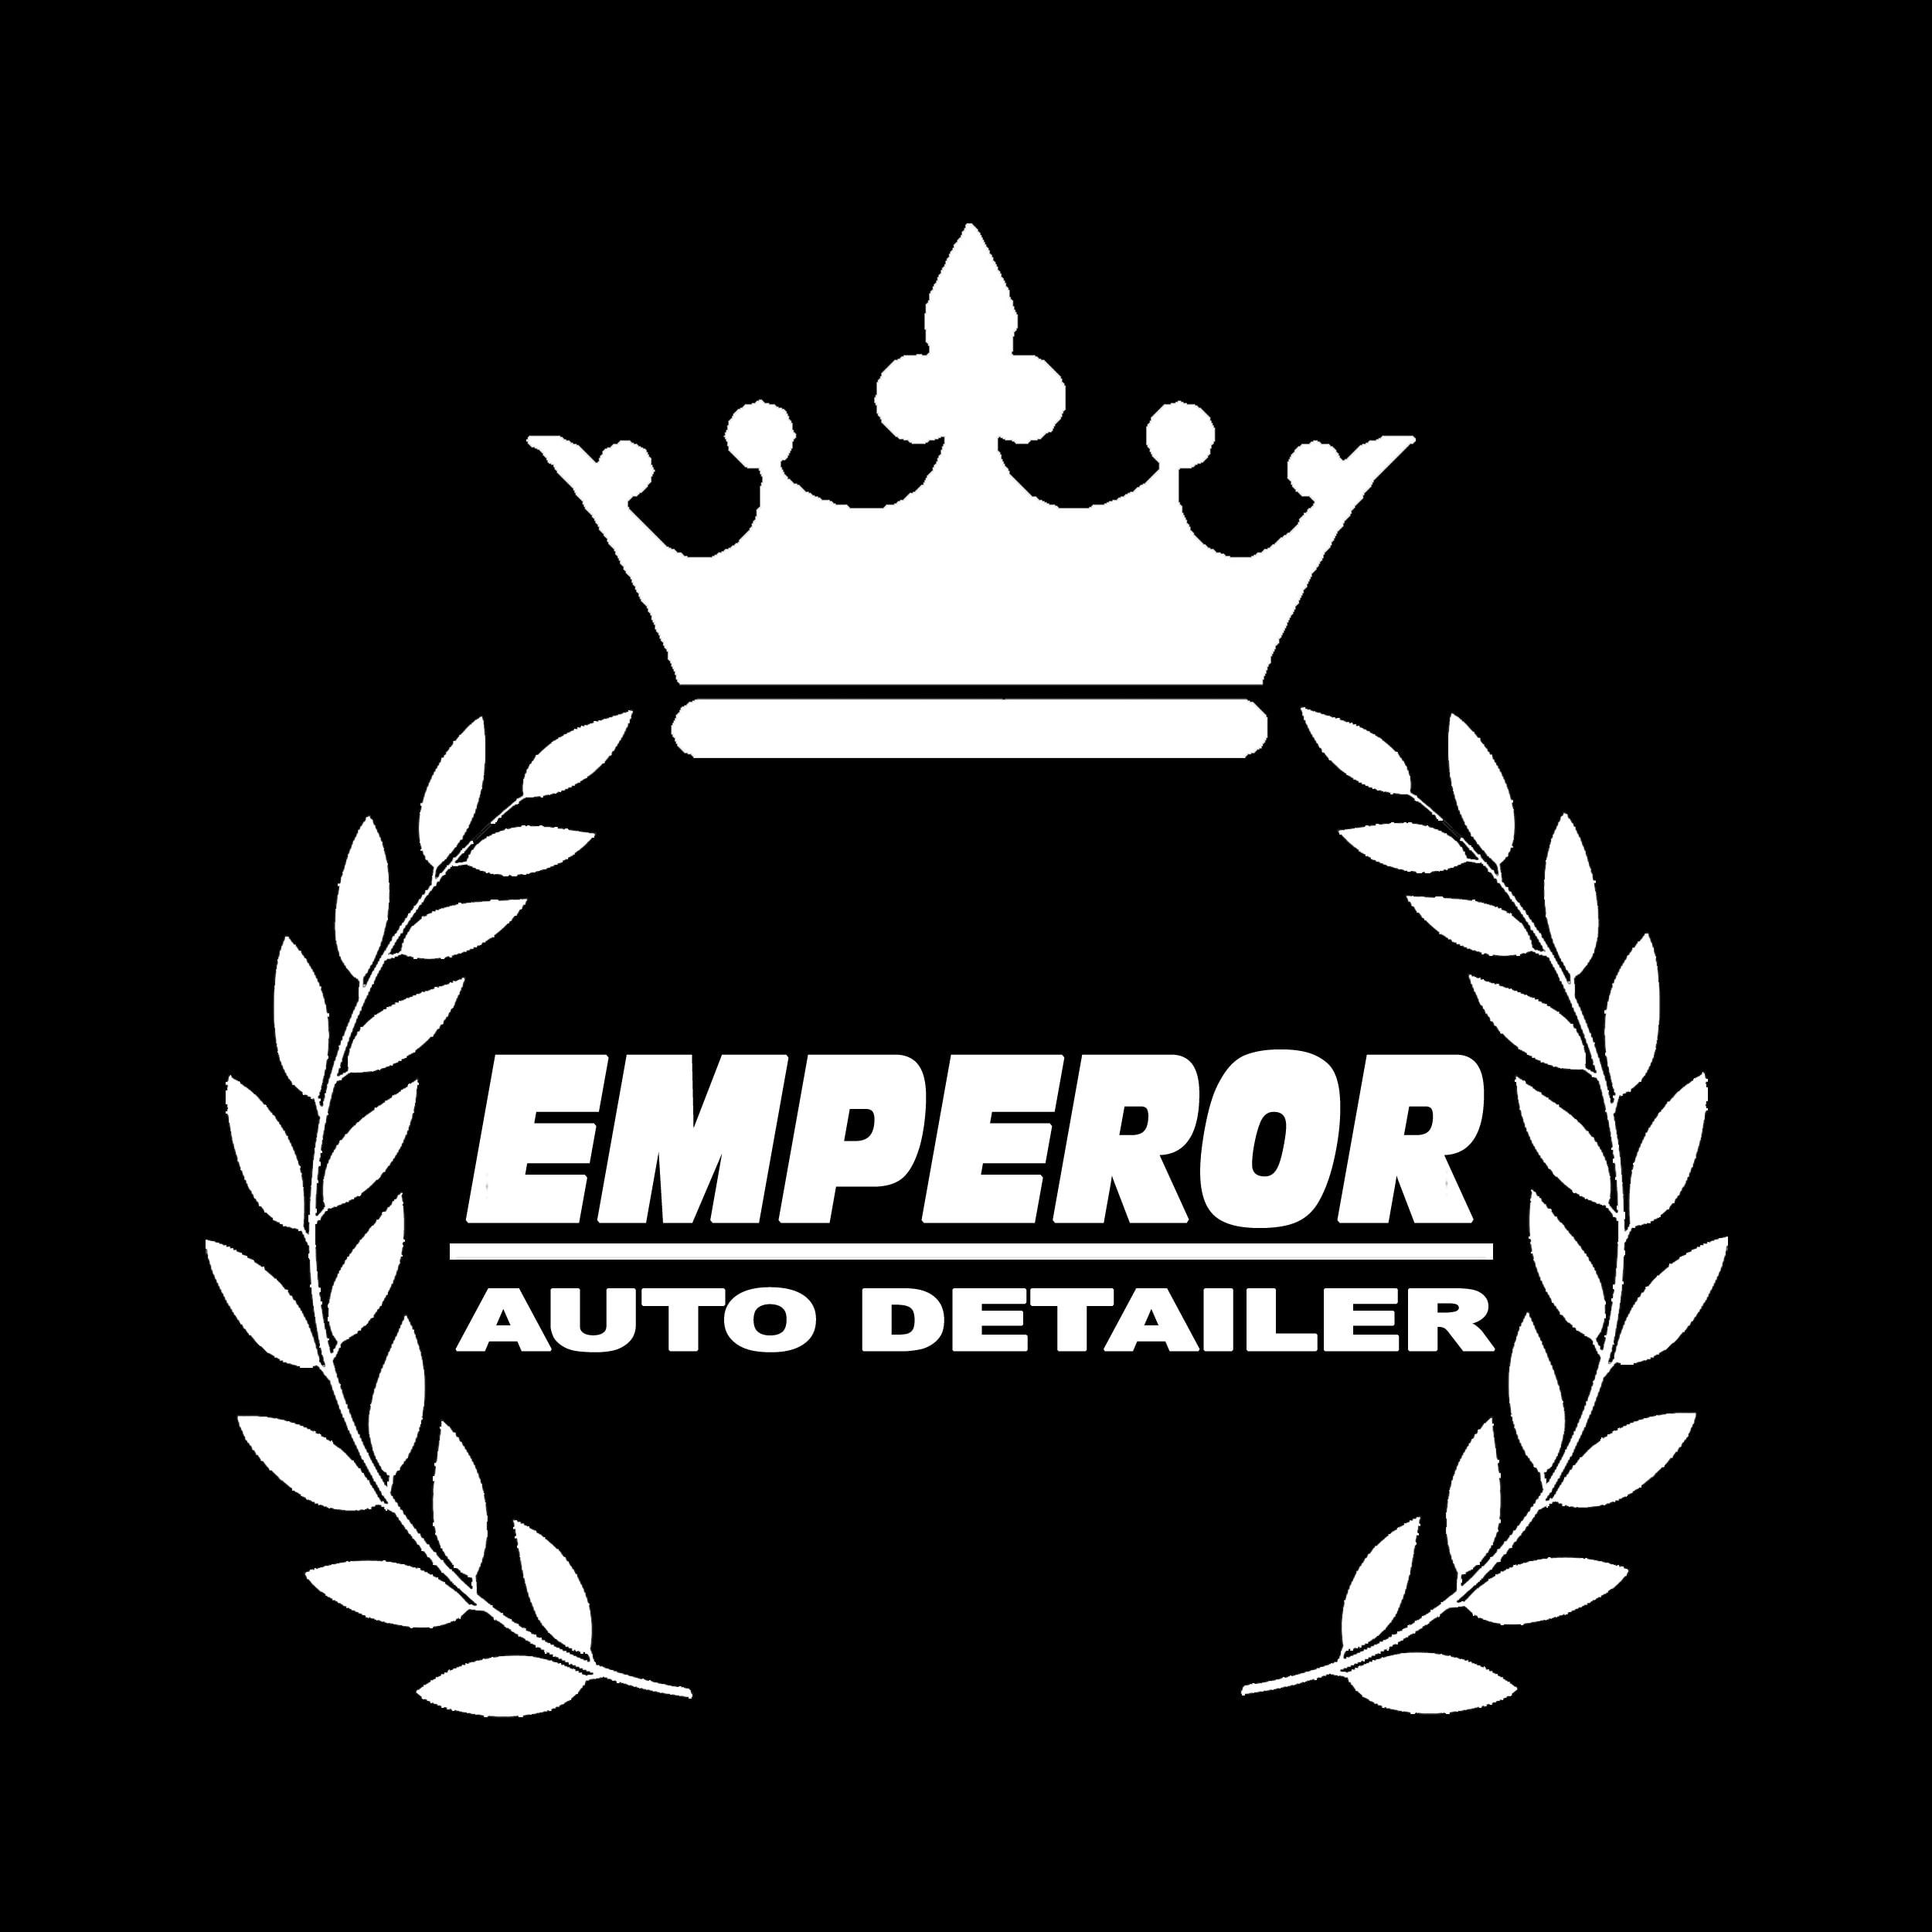 emperorautodetailer